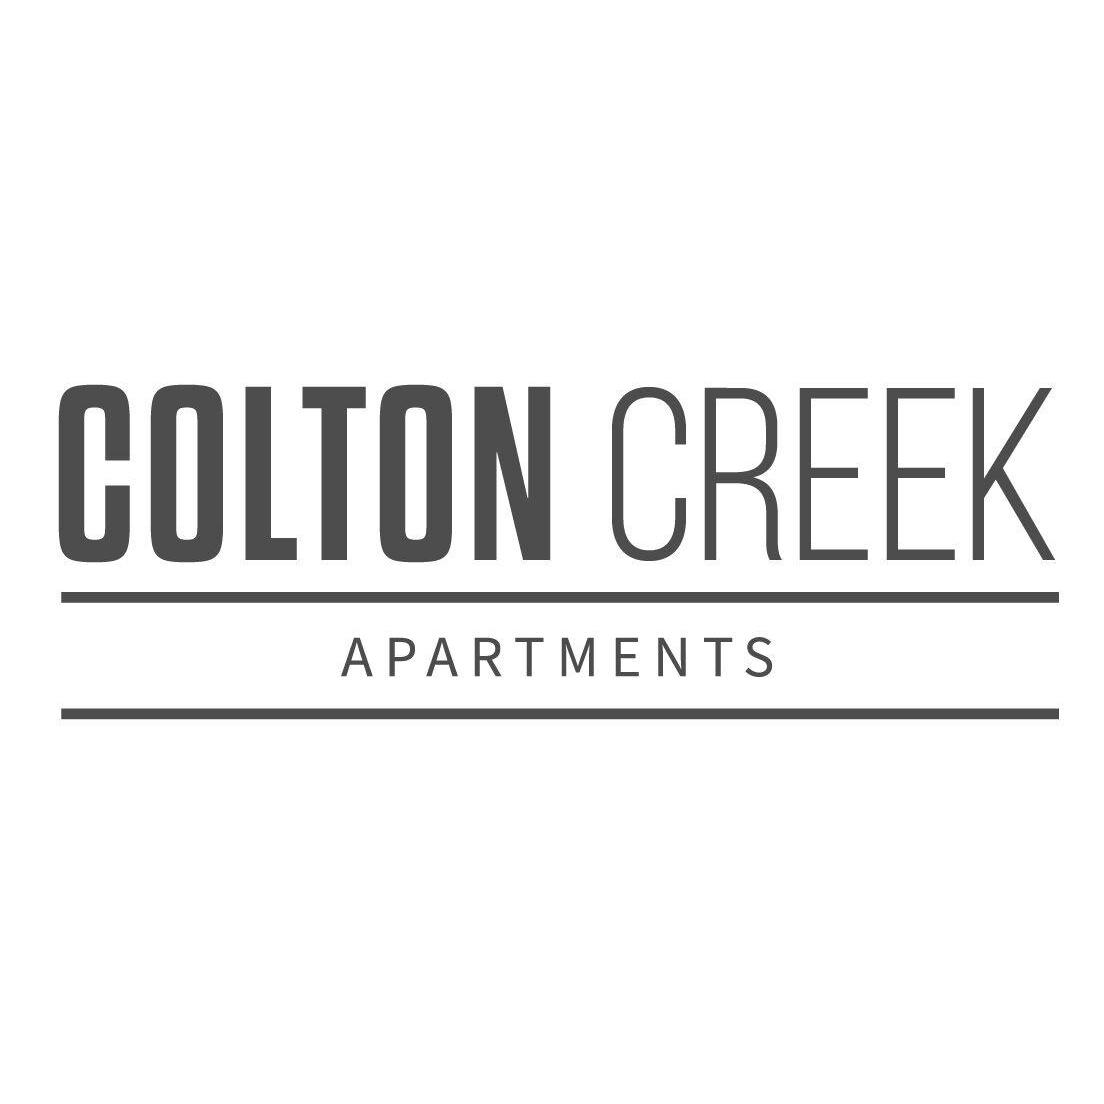 Colton Creek Apartments